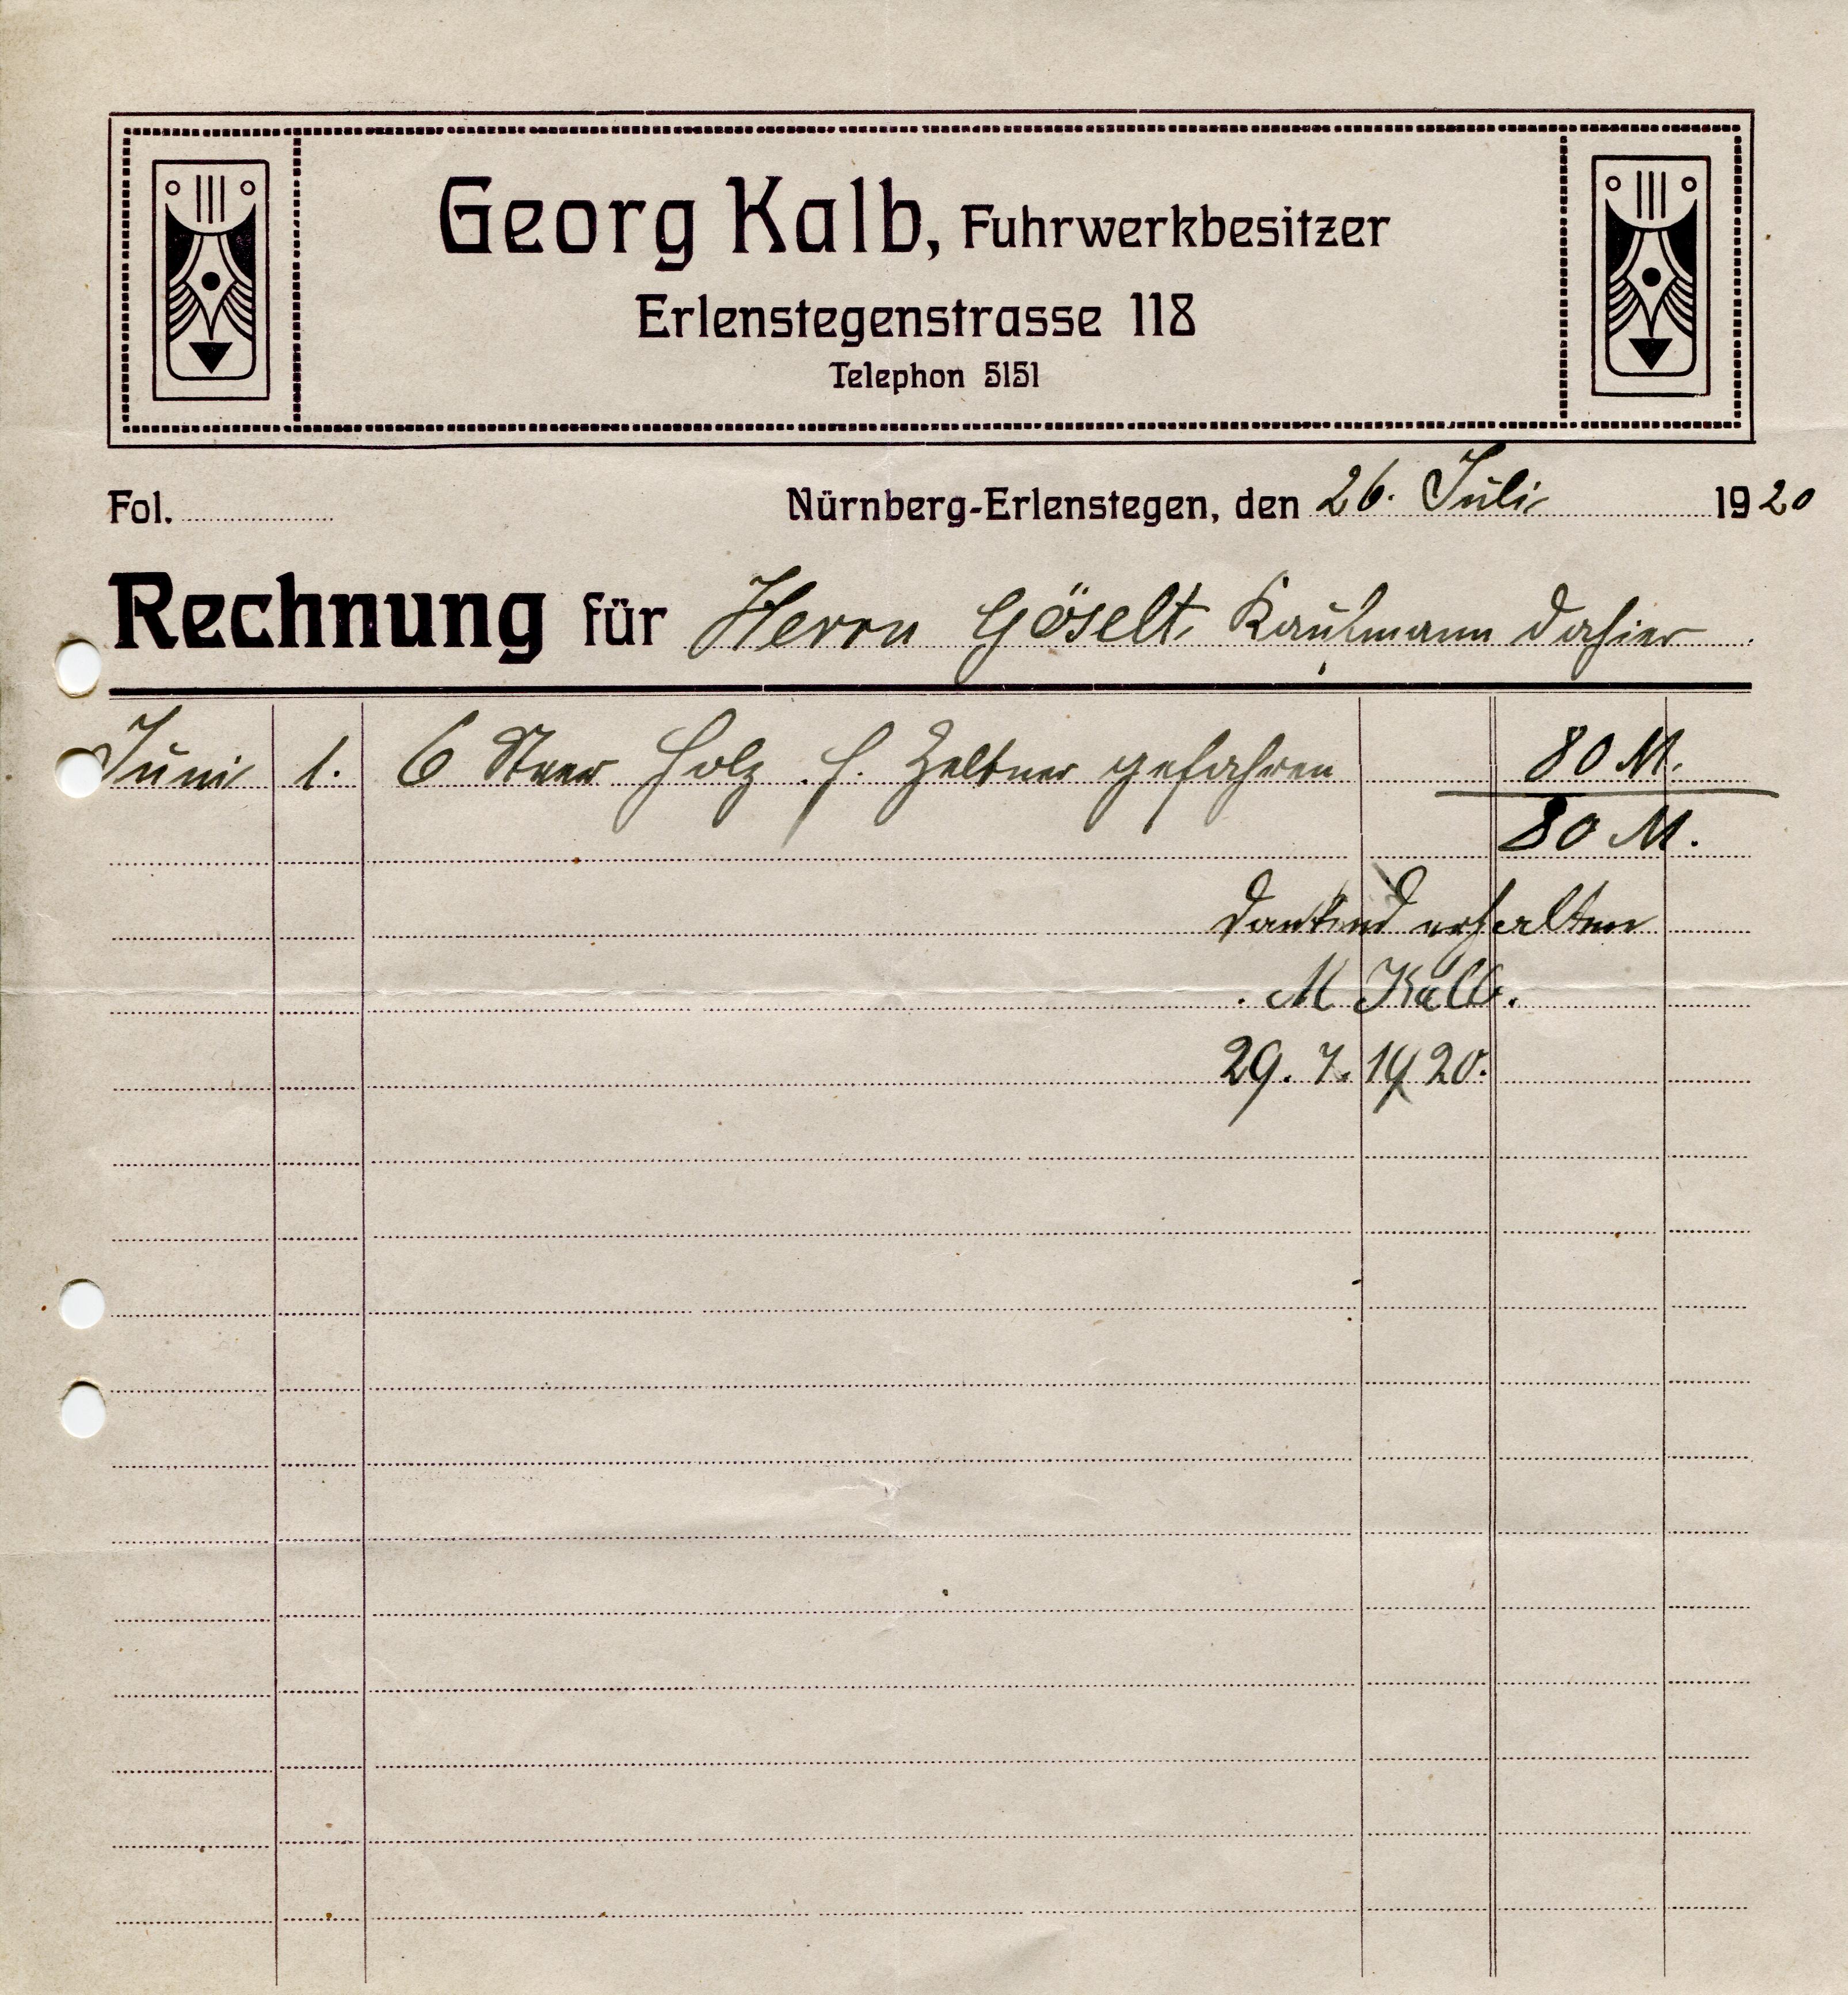 Georg Kalb Fuhrwerkbesitzer invoice, 1920 - Fonts In Use